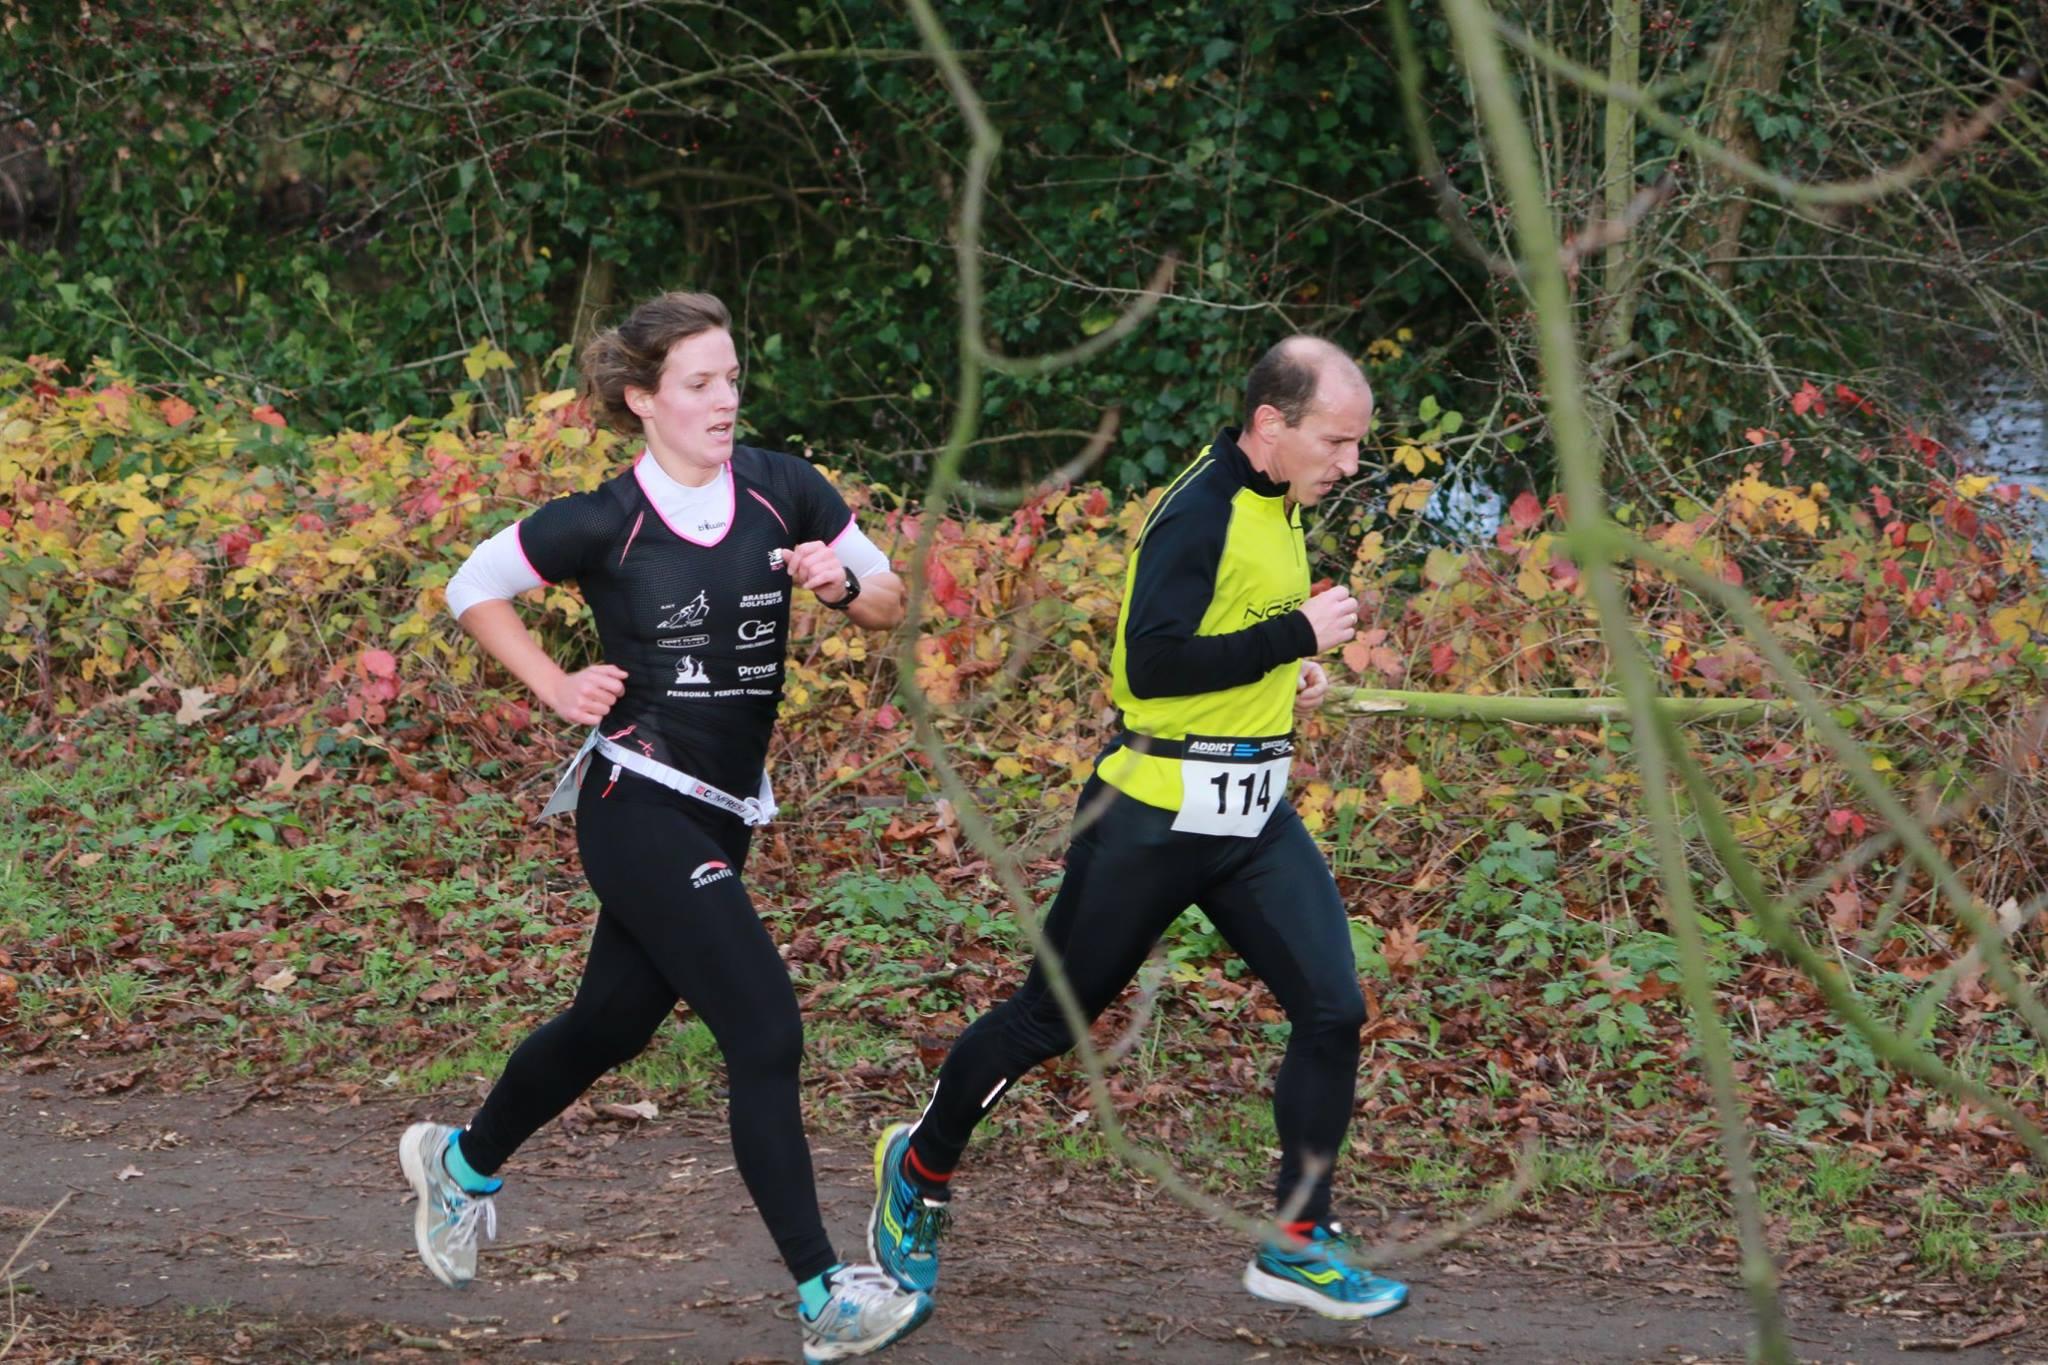 Magali Buytaert van start tot finish aan kop (foto: Chris Hofkens)